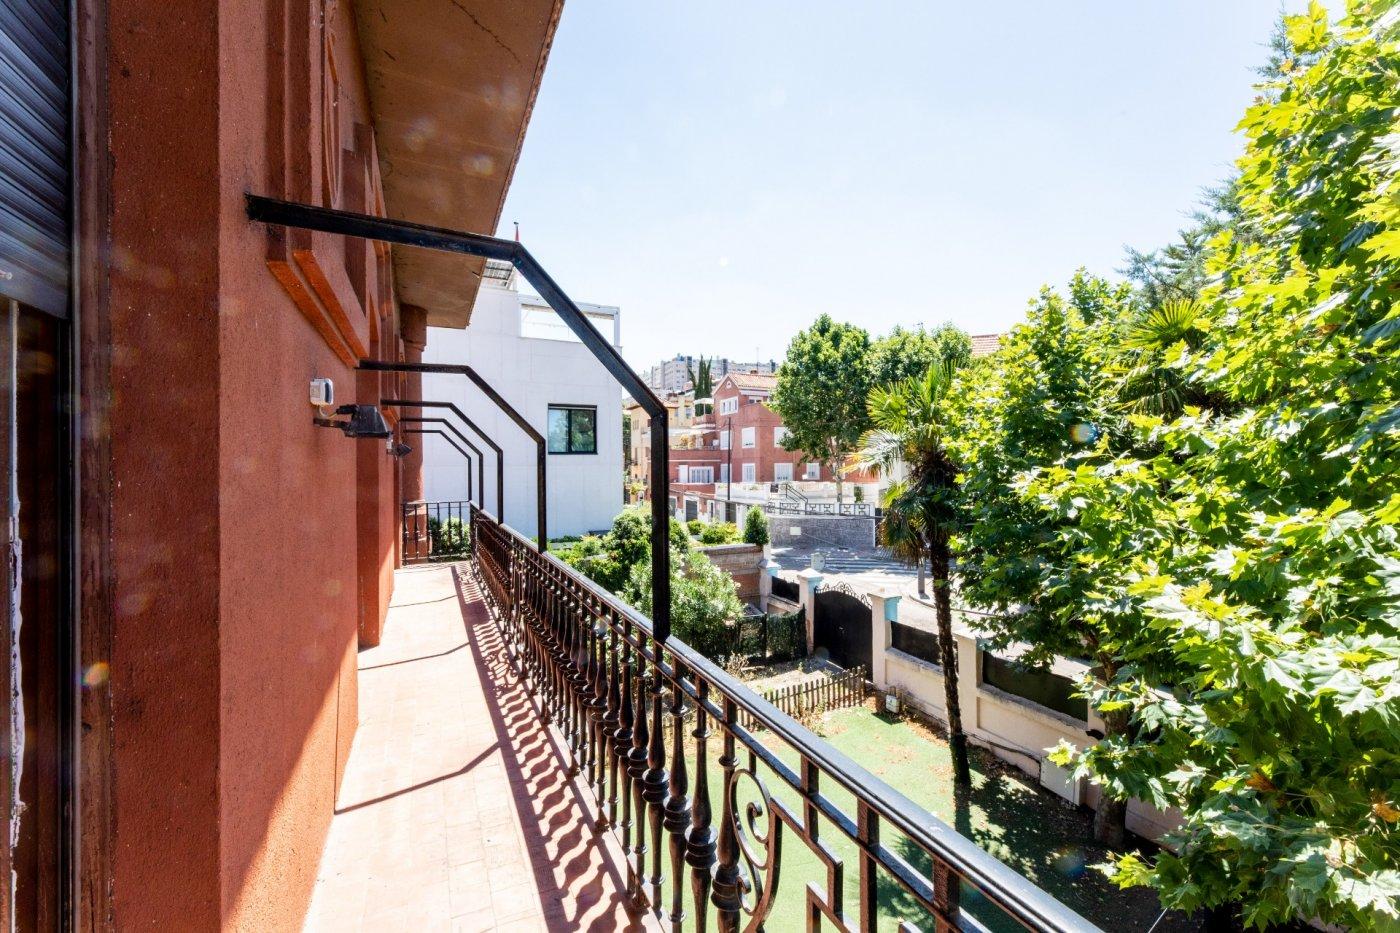 Chalet individual en venta, OLIVOS, Madrid